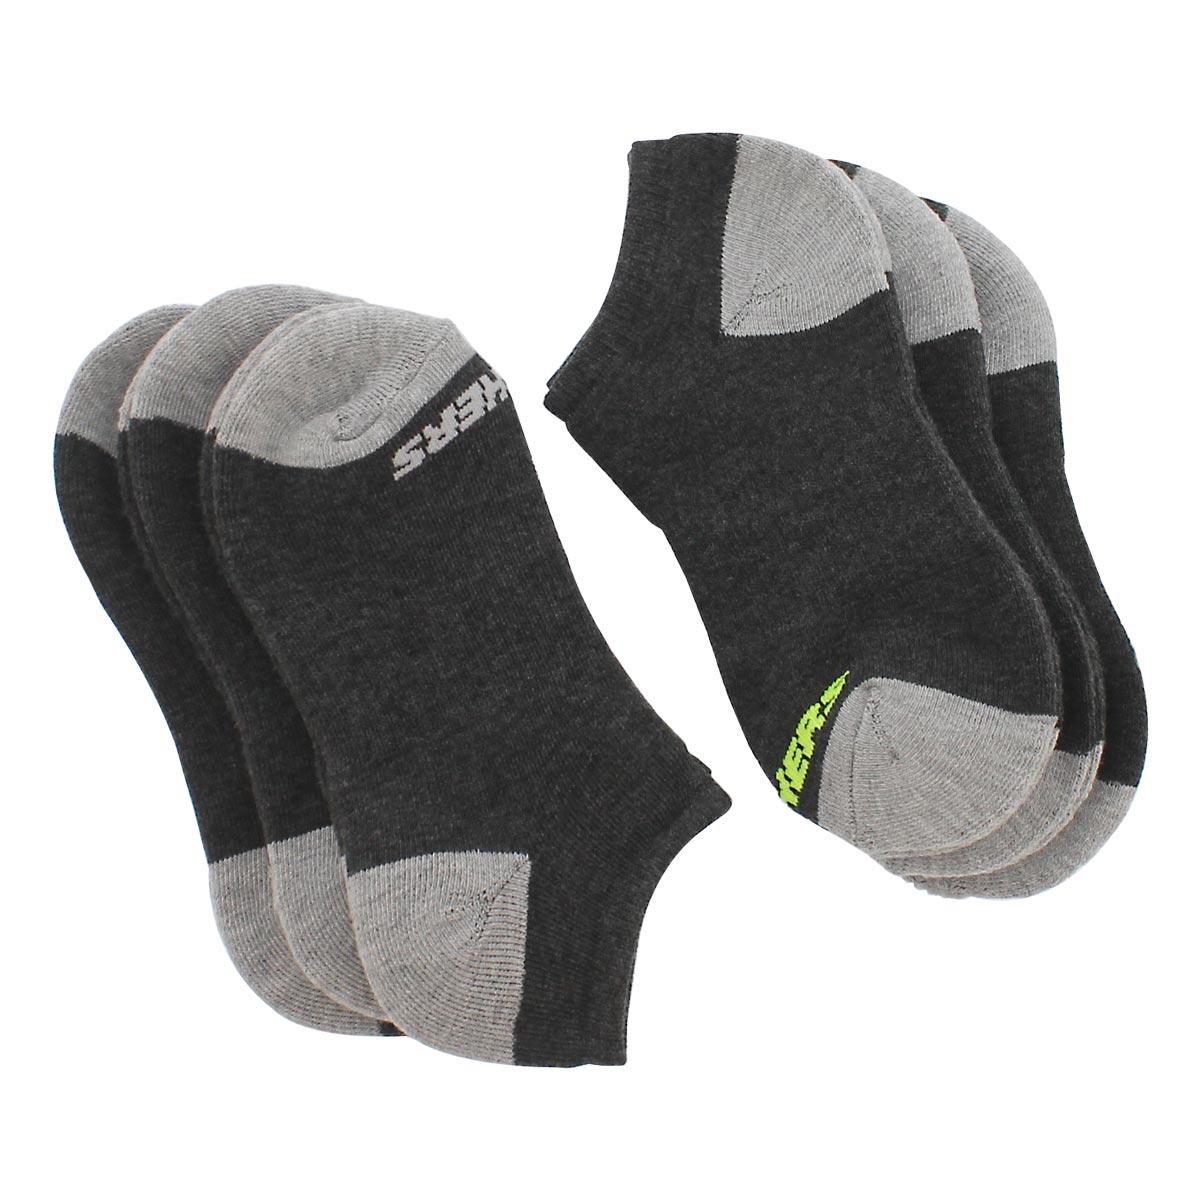 Boys' NO SHOW FULL TERRY black multi socks -6pk